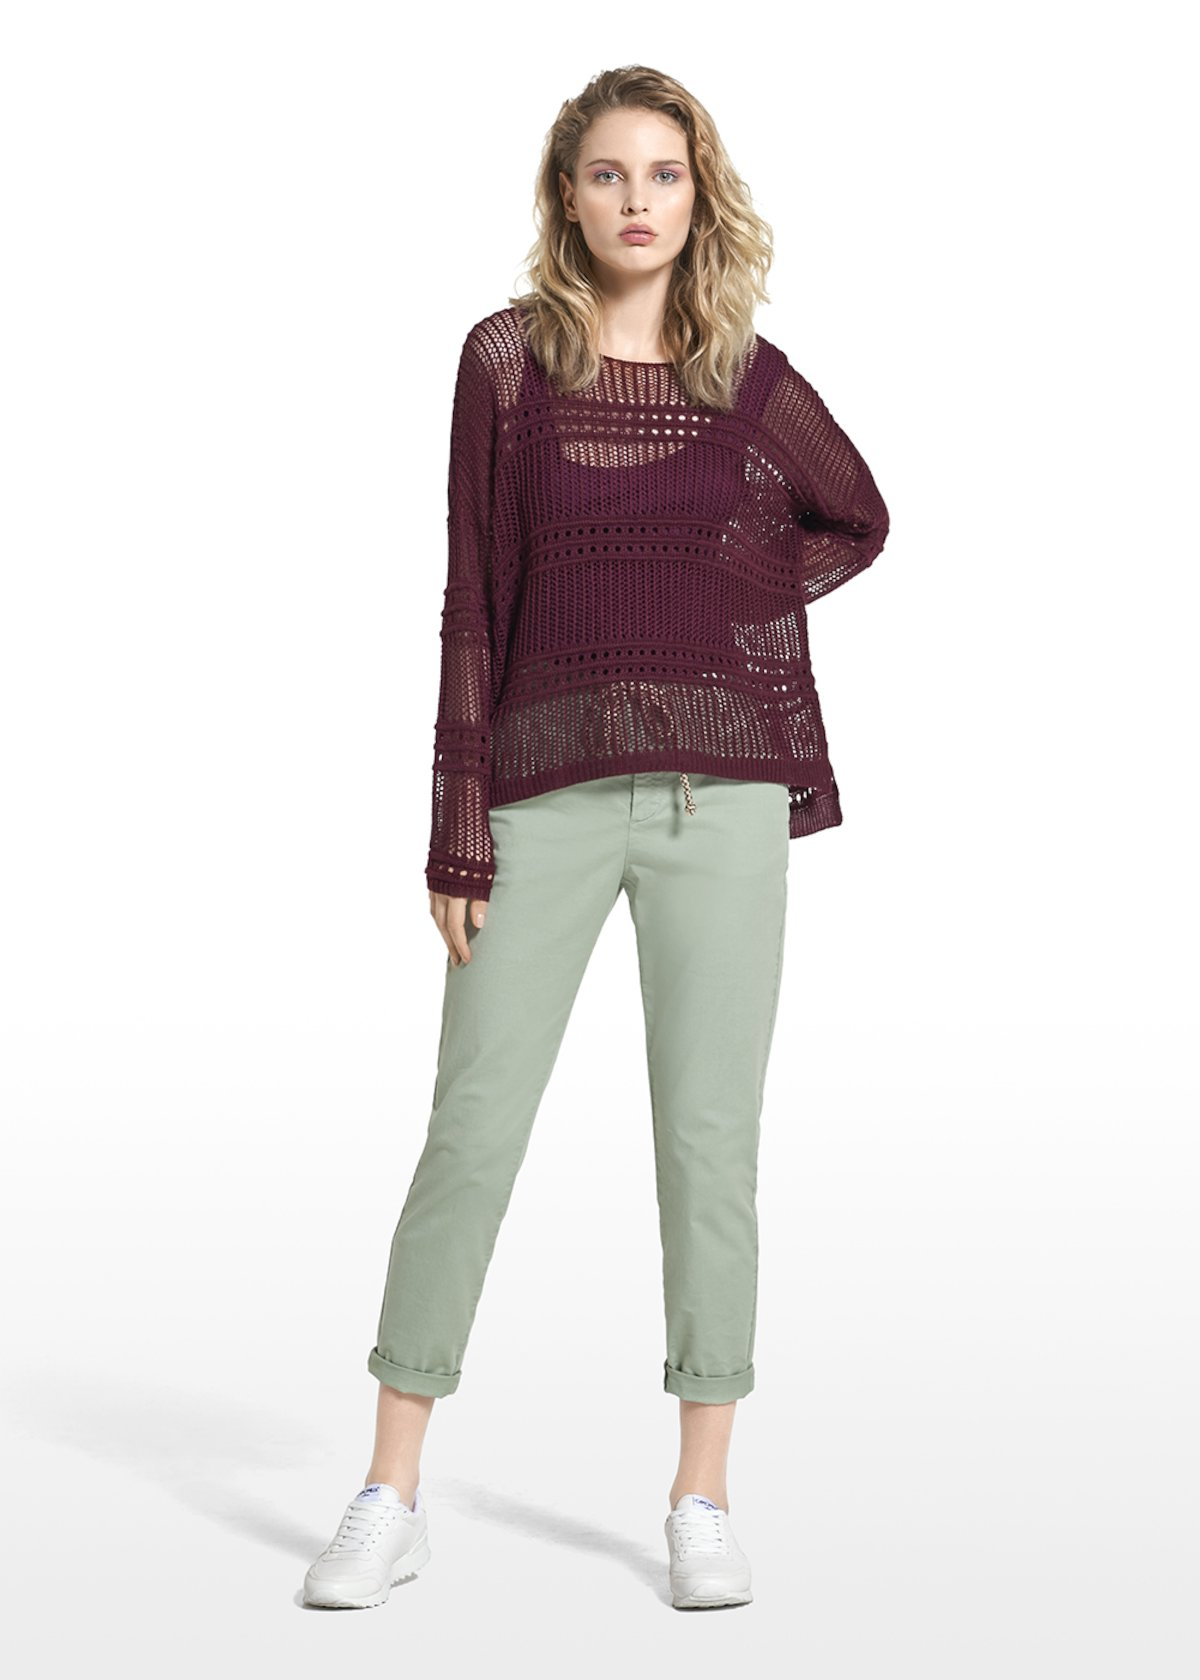 Pantaloni Pixy con dettaglio corda - Alga - Donna